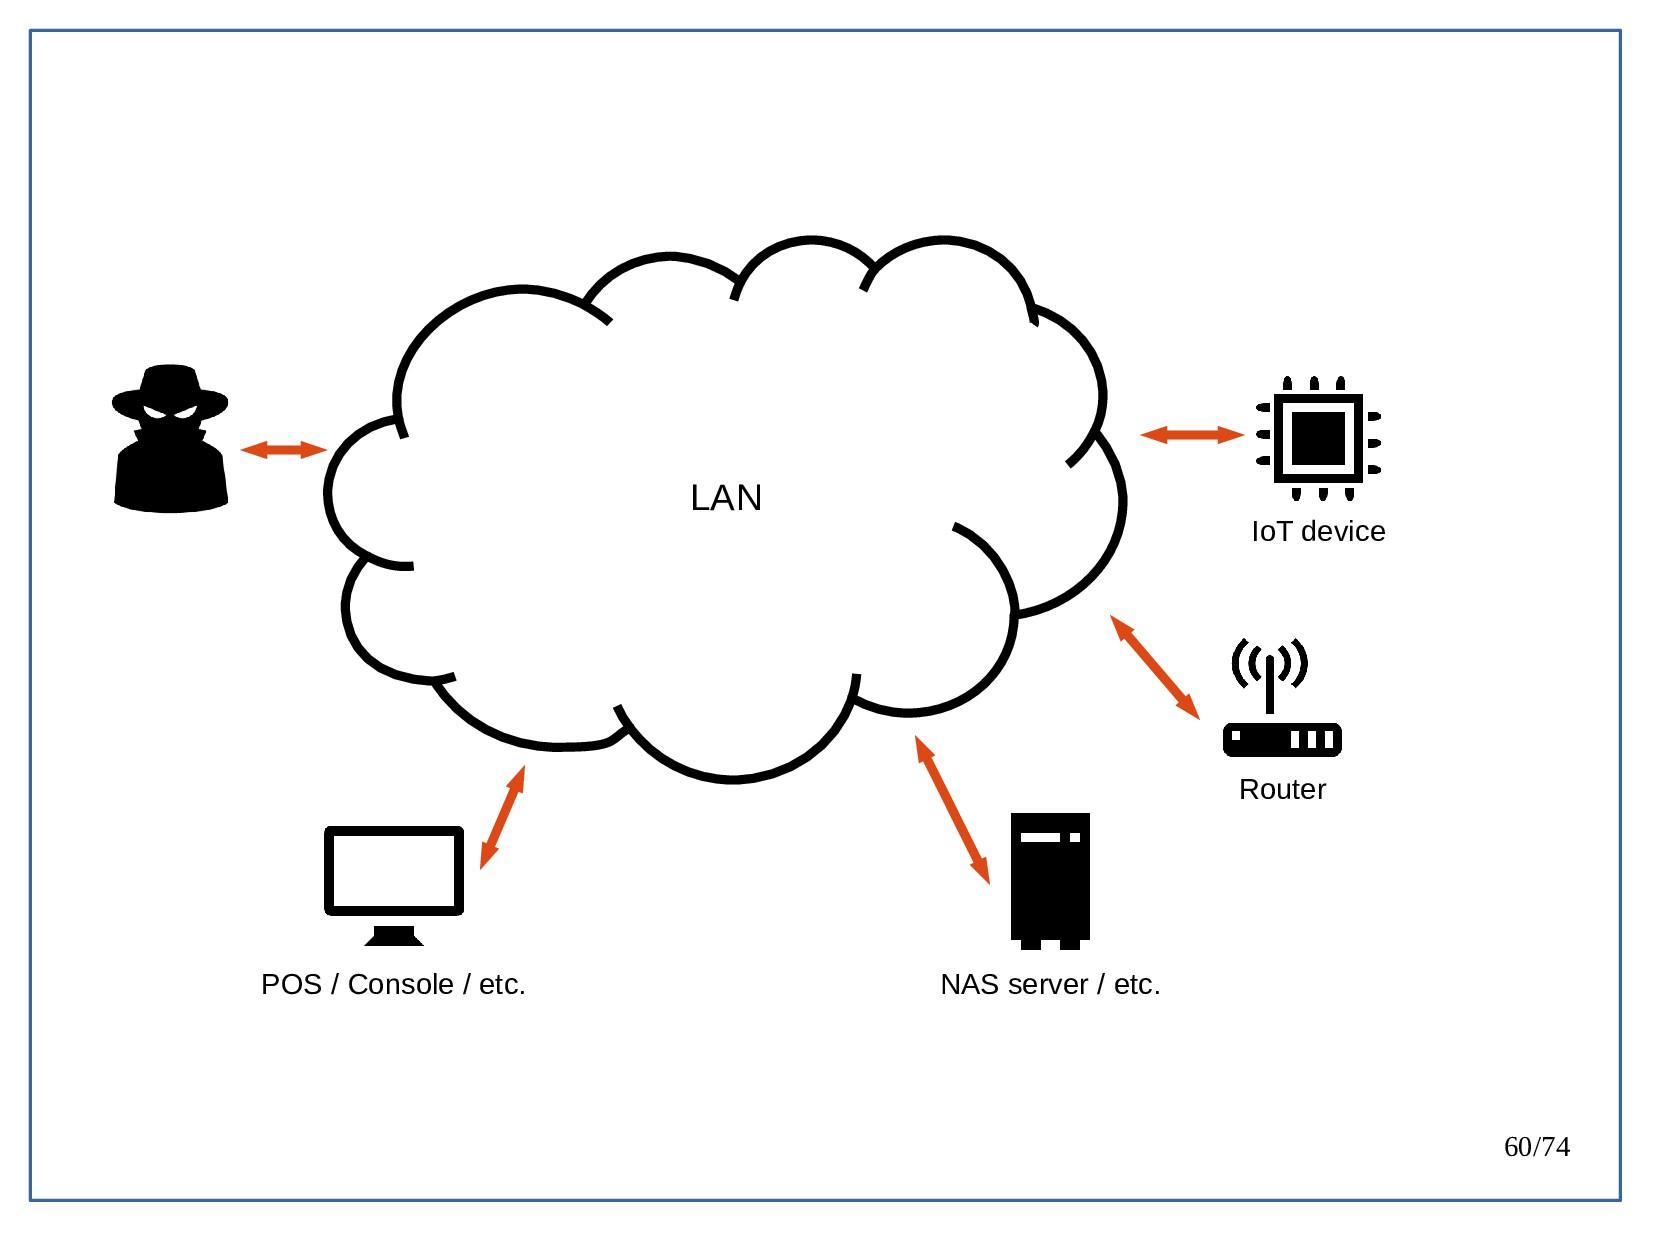 60/74 LAN Router IoT device NAS server / etc. P...